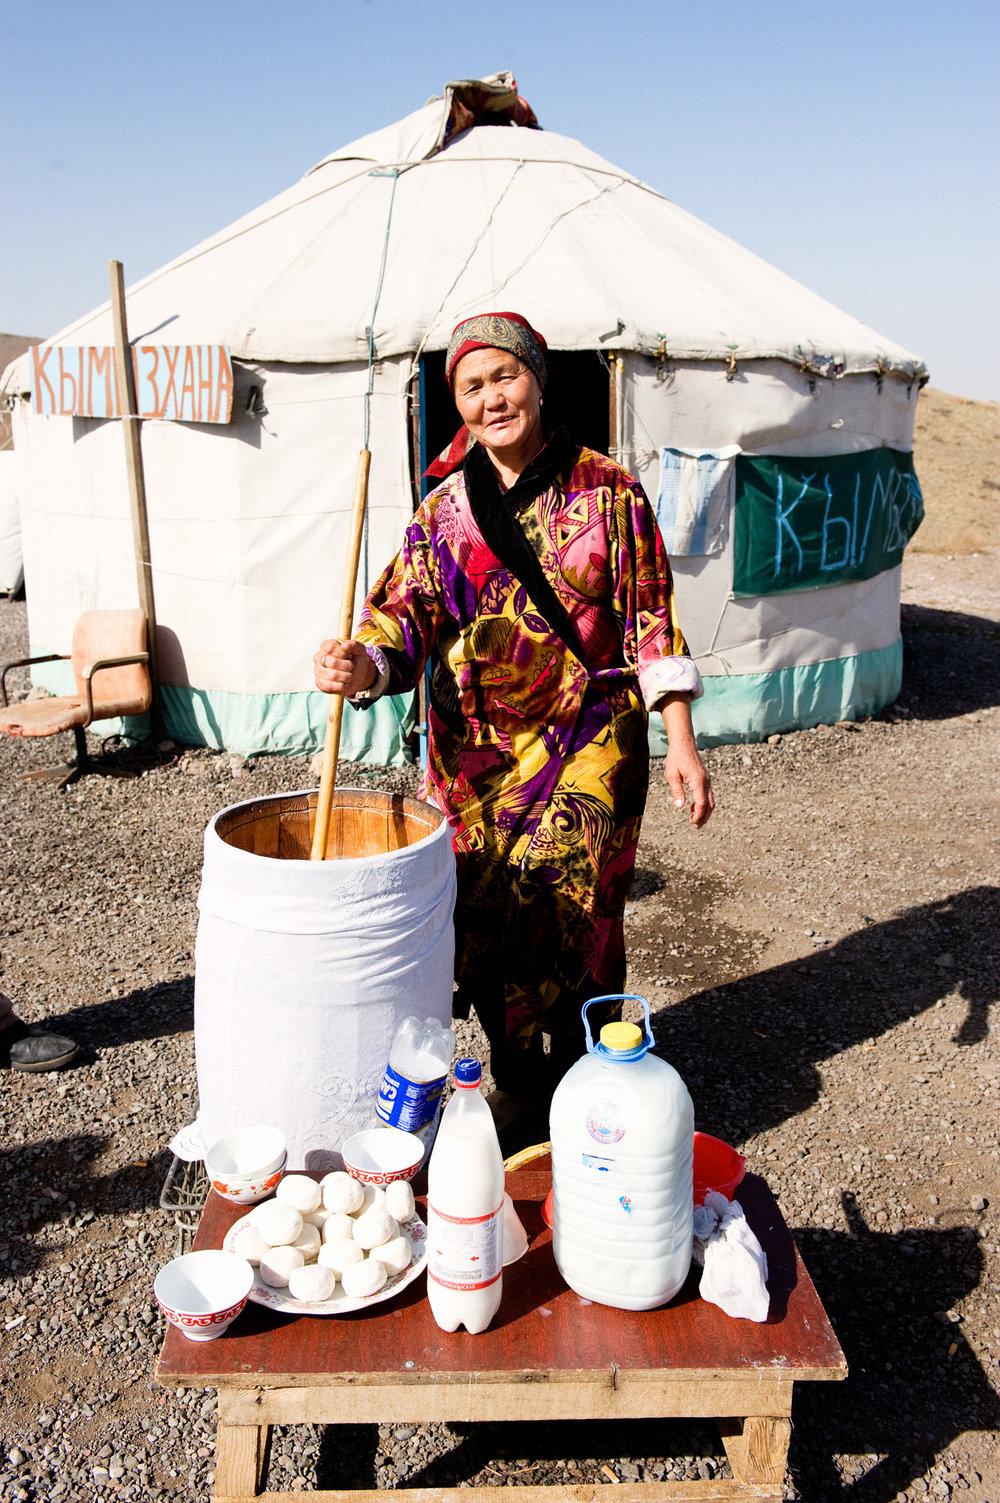 Mare's Milk Vendor - Kazakhstan / Kyrgyzstan Border